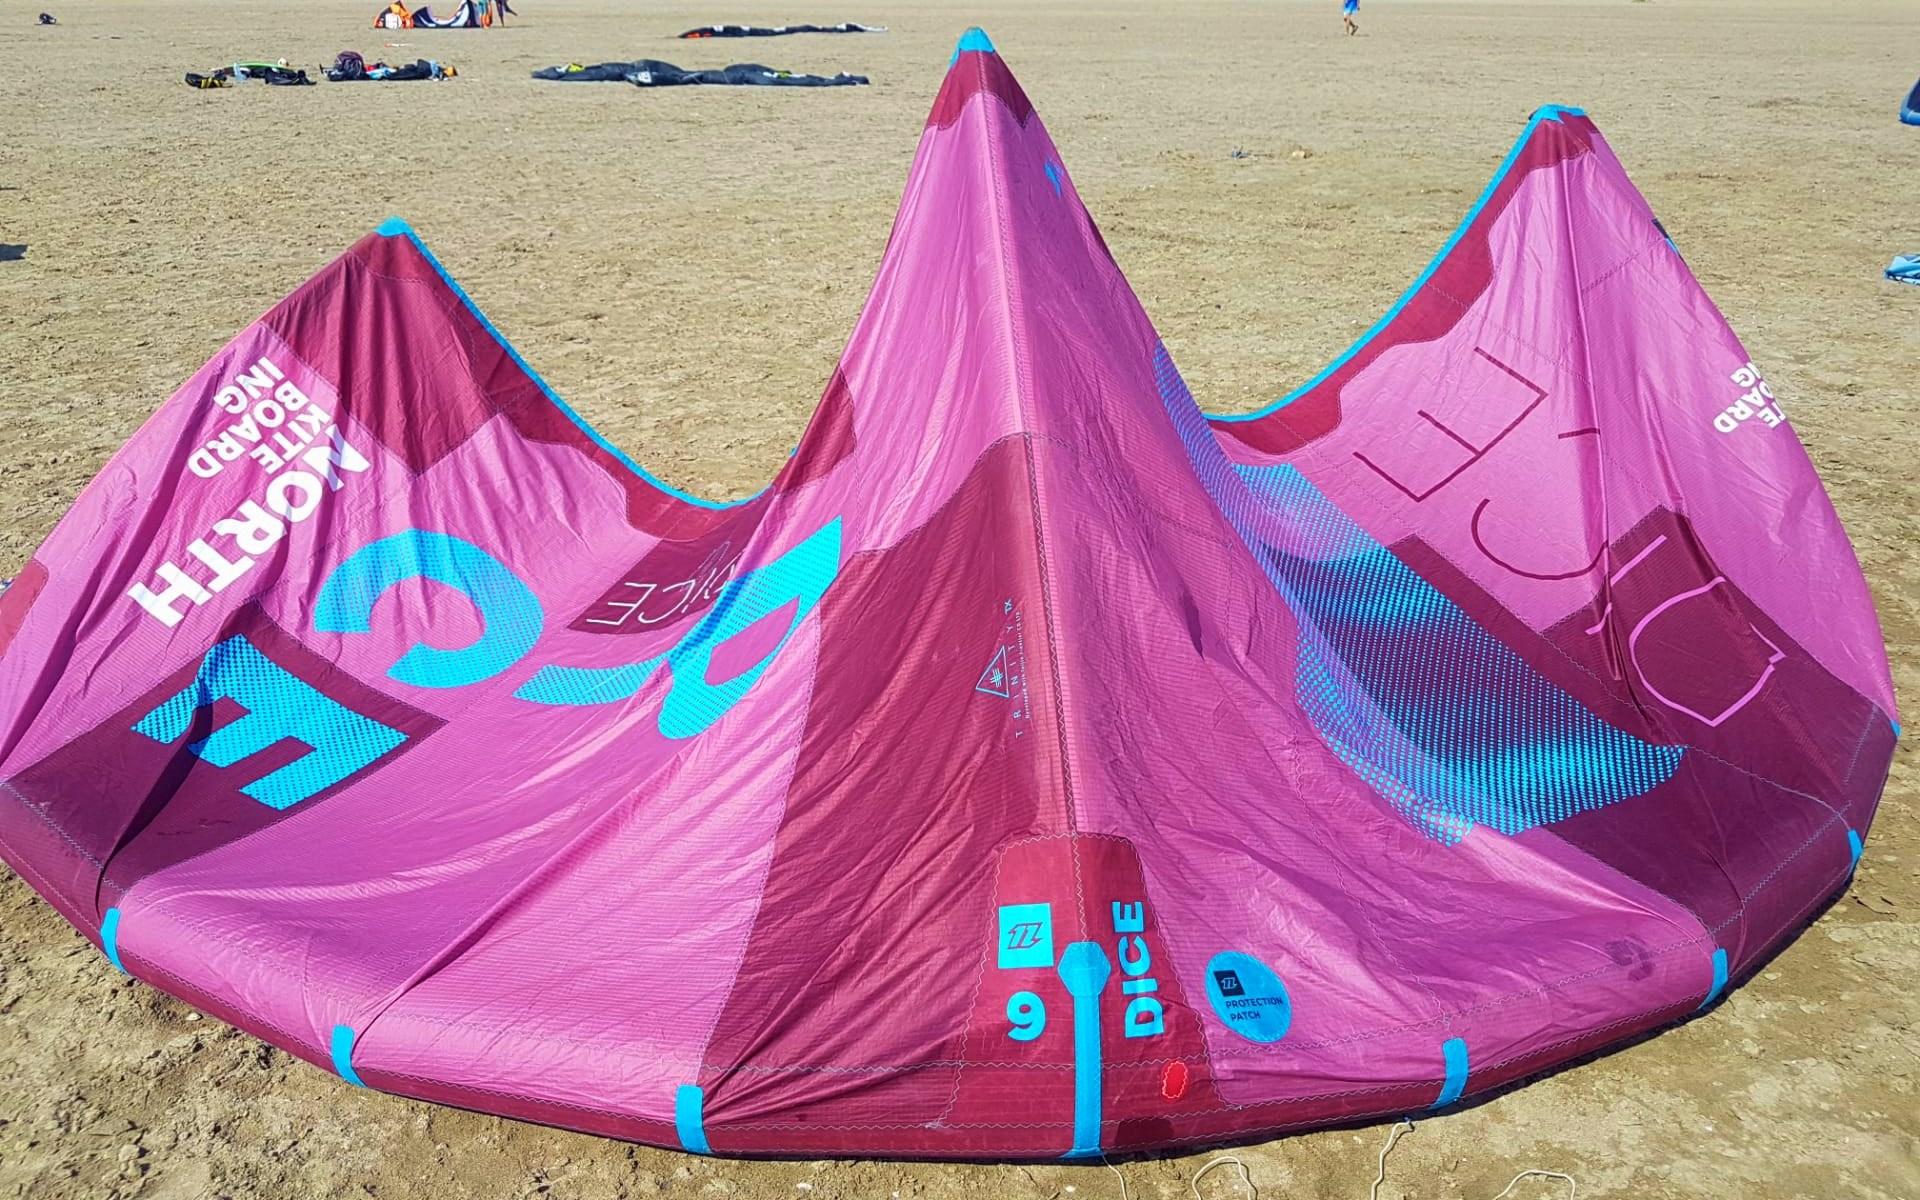 Test North Dice 2018, aile de kitesurf